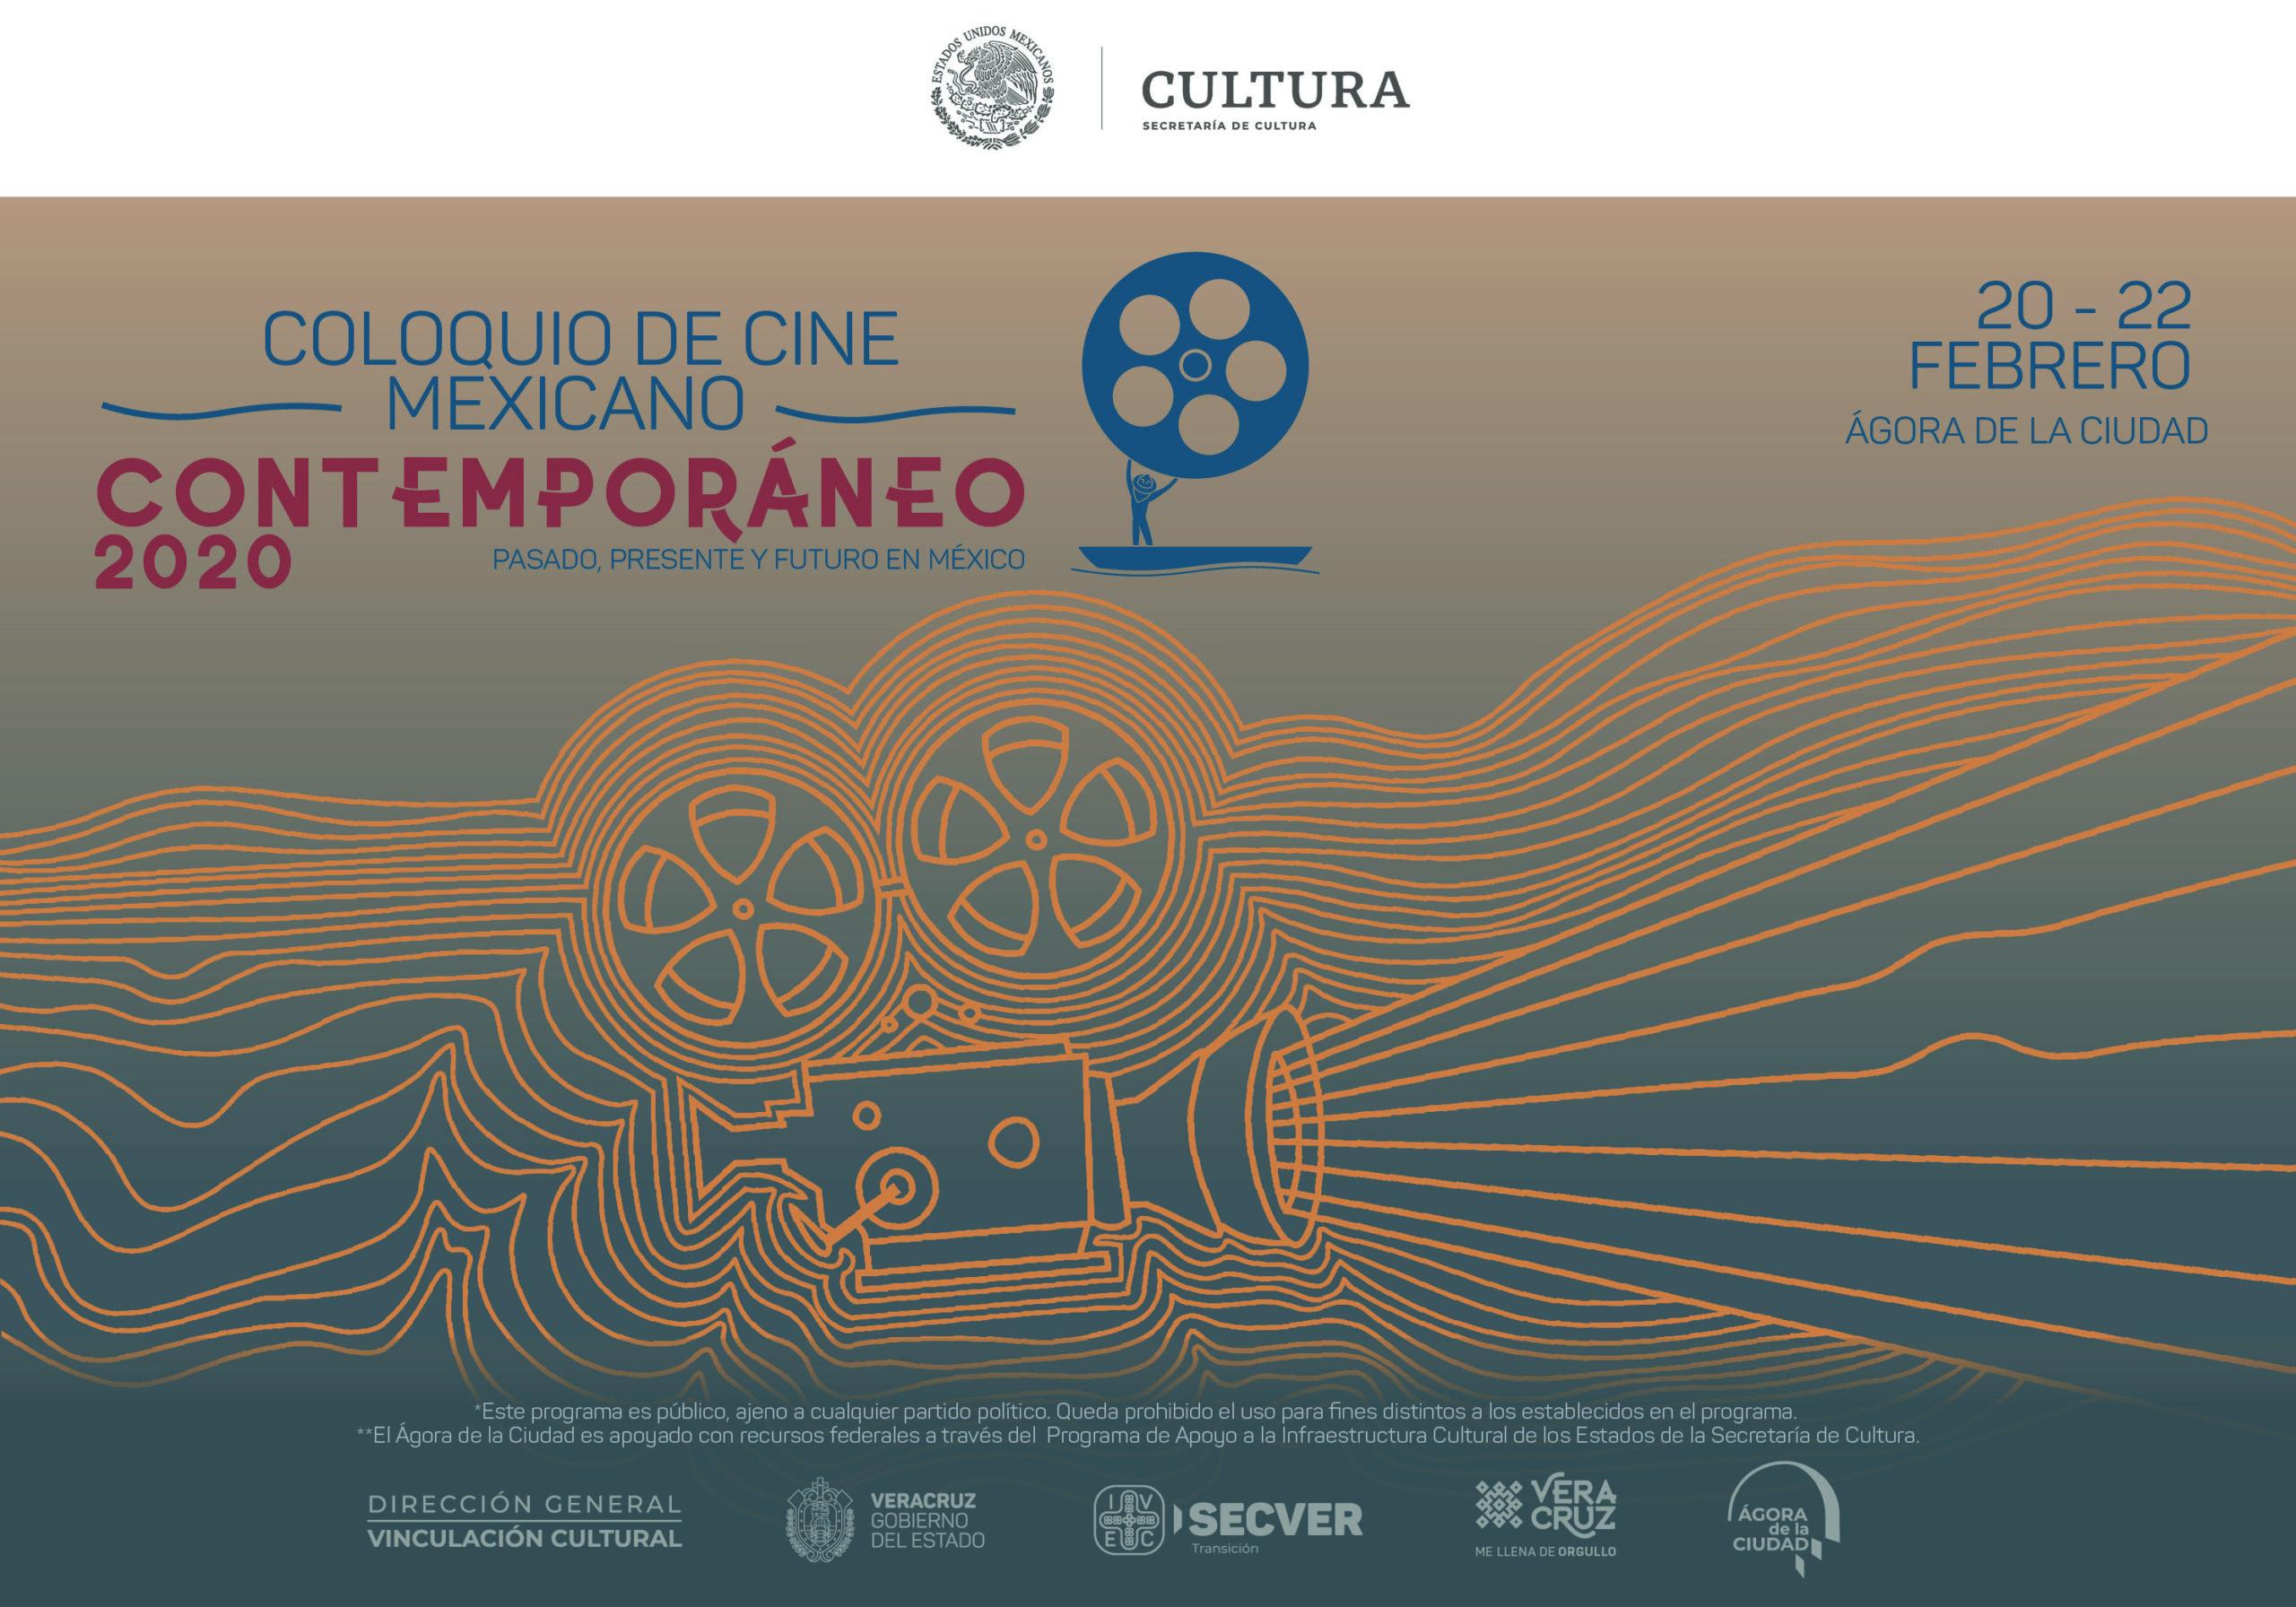 Presenta IVEC Coloquio de Cine Mexicano Contemporáneo 2020